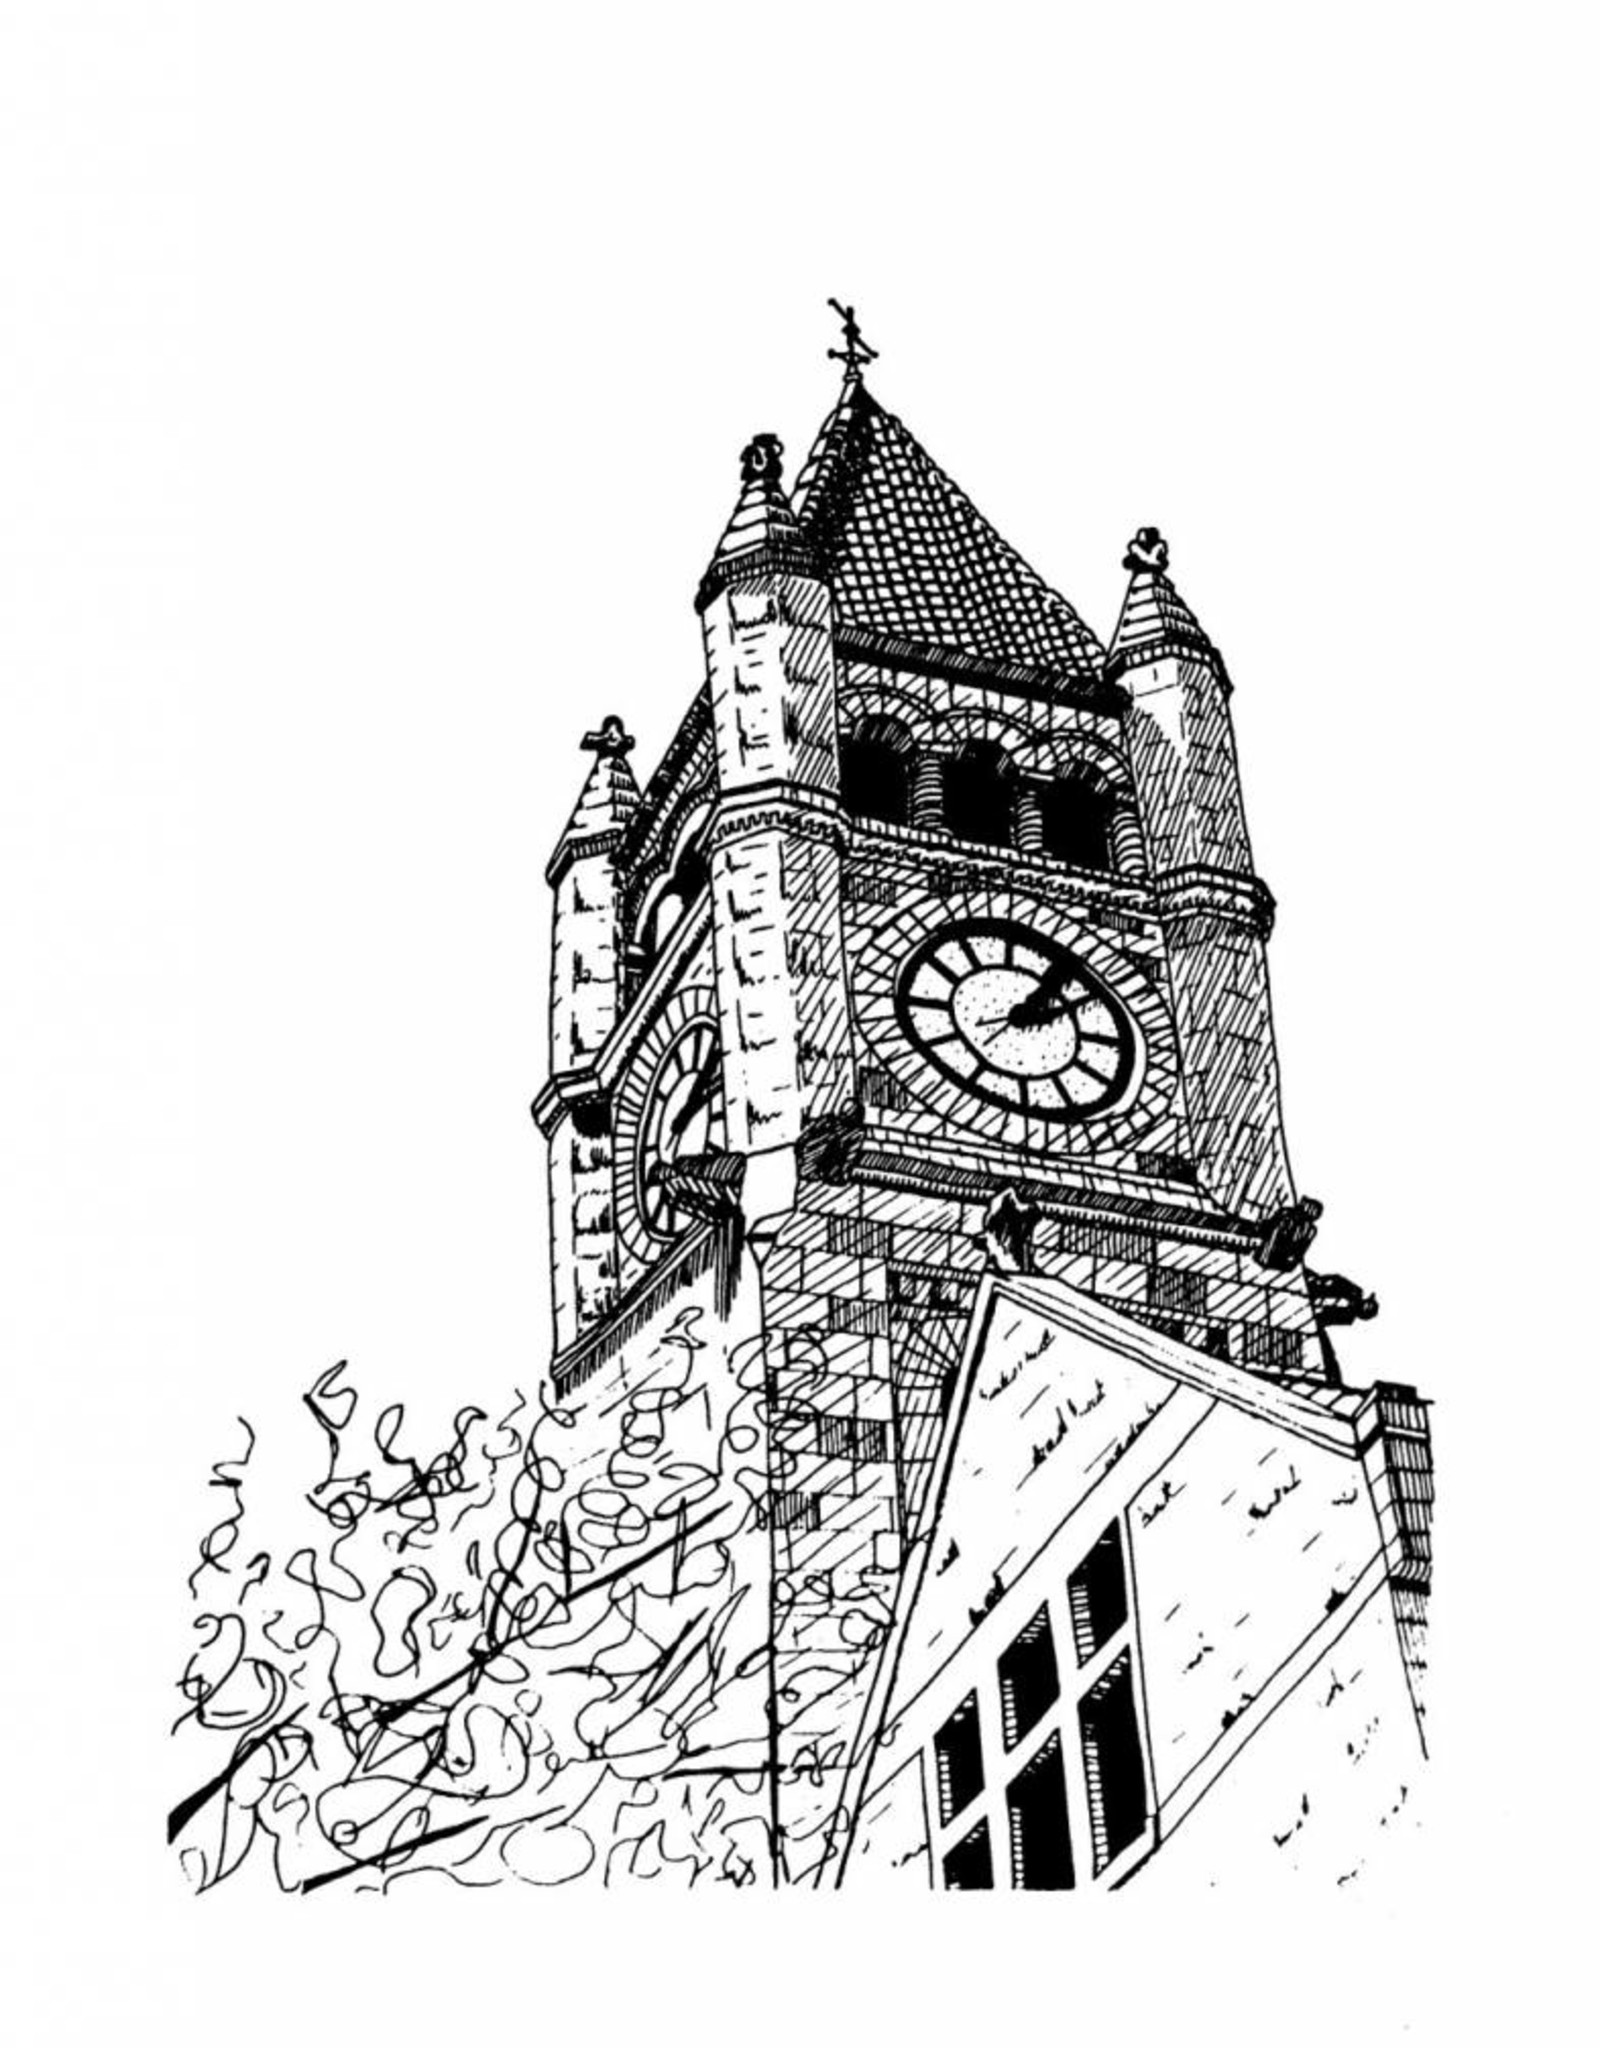 6 - Elizabeth Patterson Xenia Clock Tower